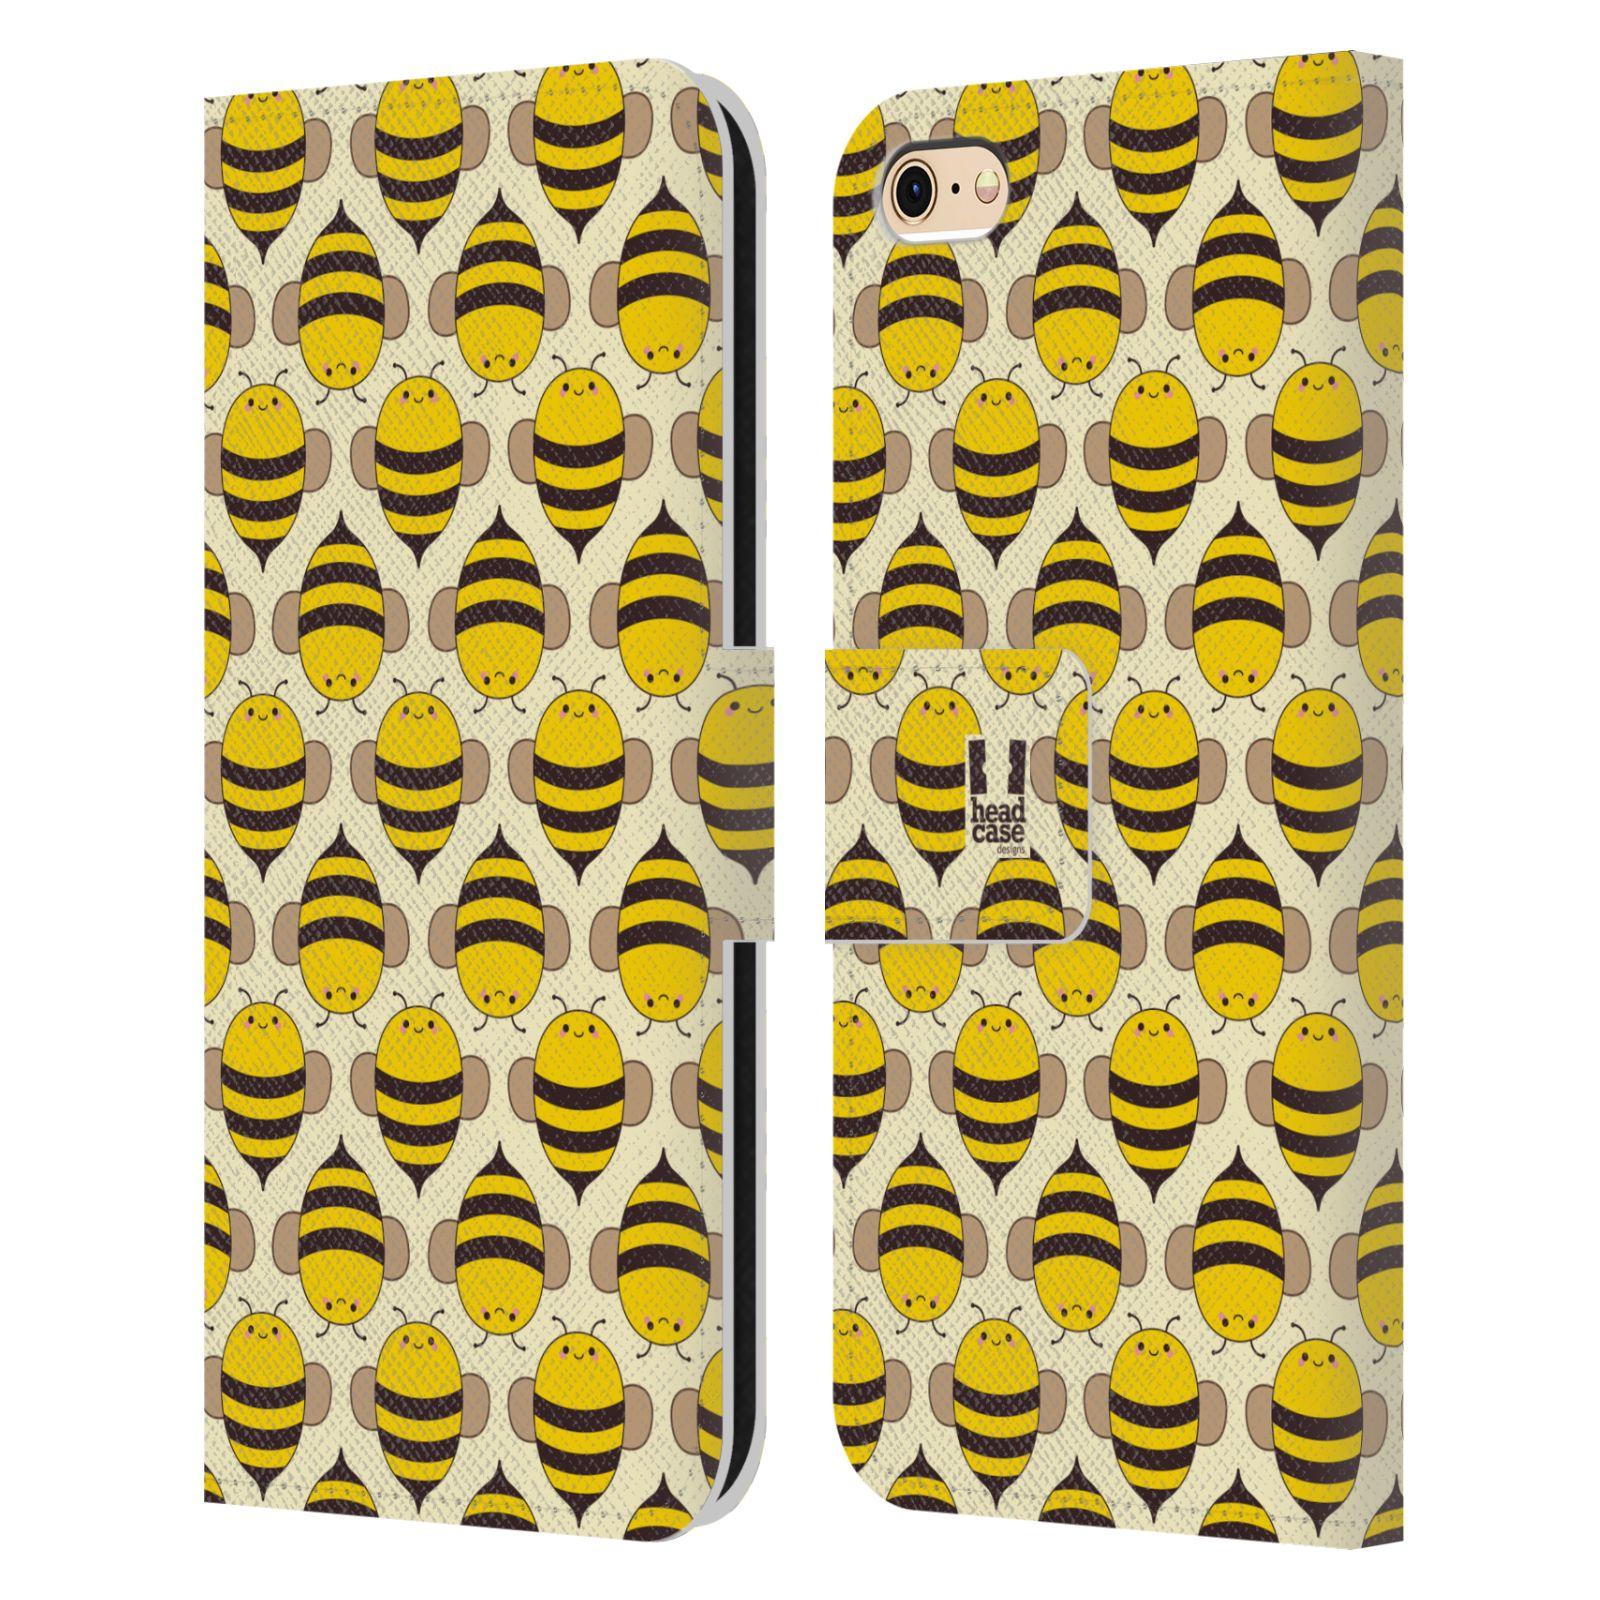 HEAD CASE Flipové pouzdro pro mobil Apple Iphone 6/6s VČELÍ VZOR kolonie včelek